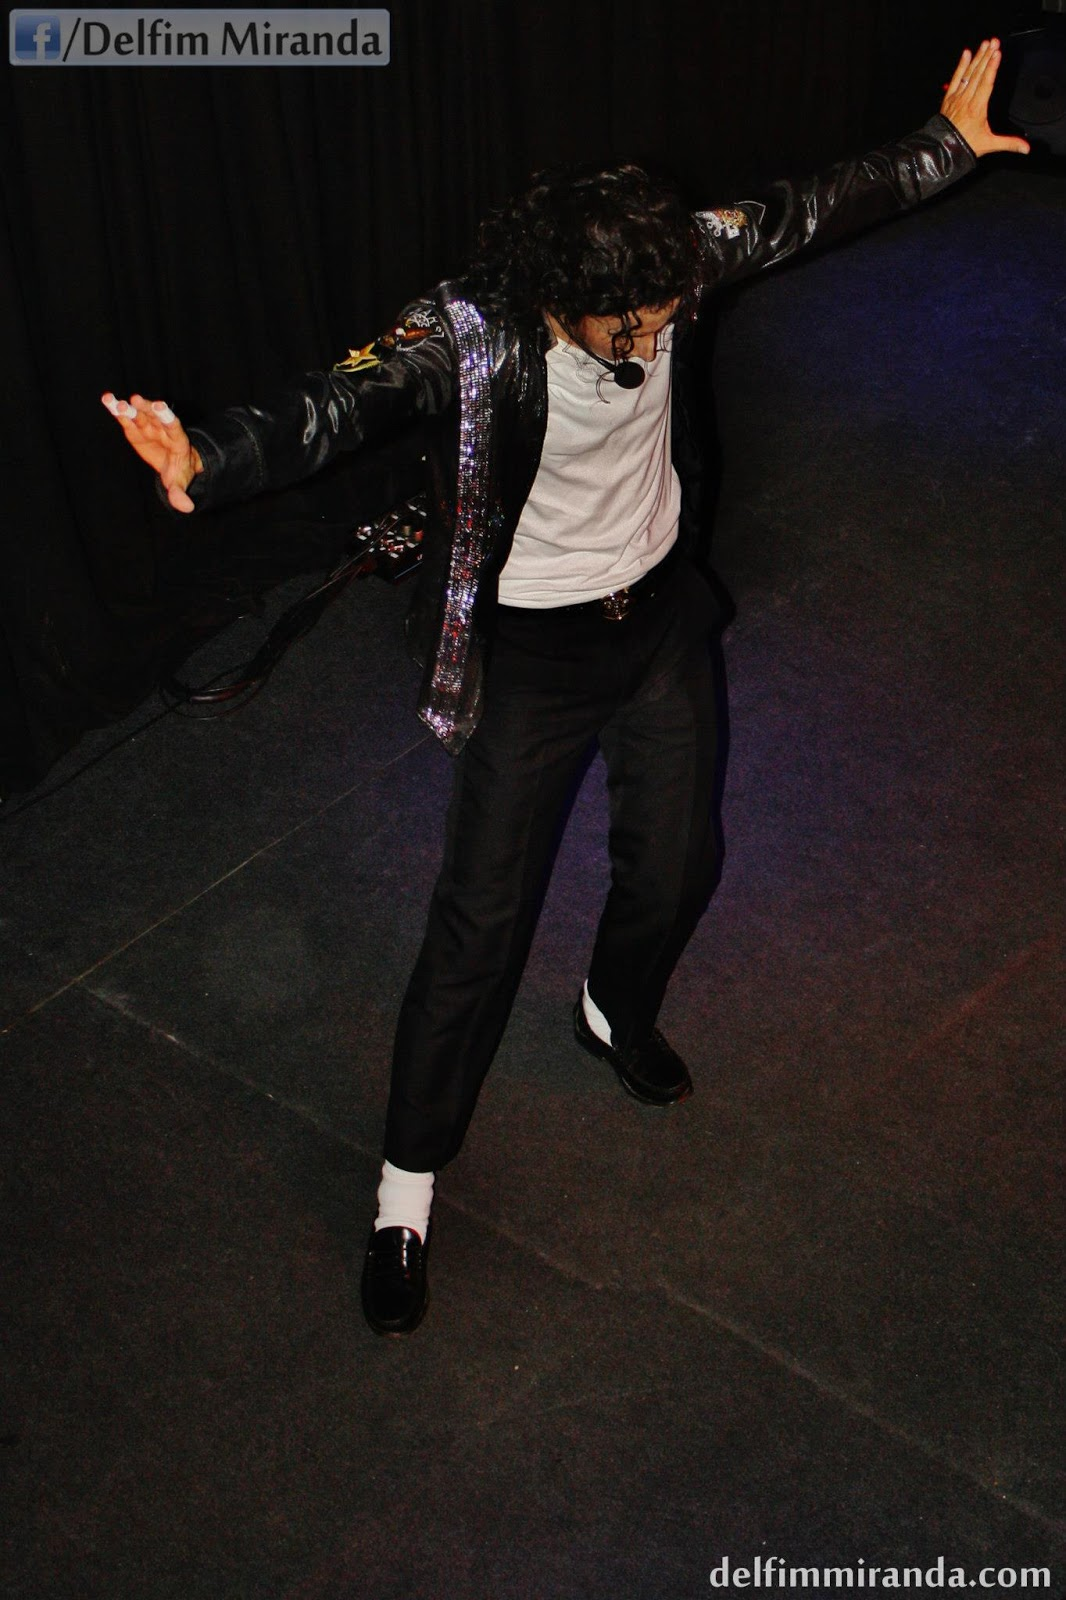 Delfim Miranda - Michael Jackson Tribute - Behind the Mask - Top View